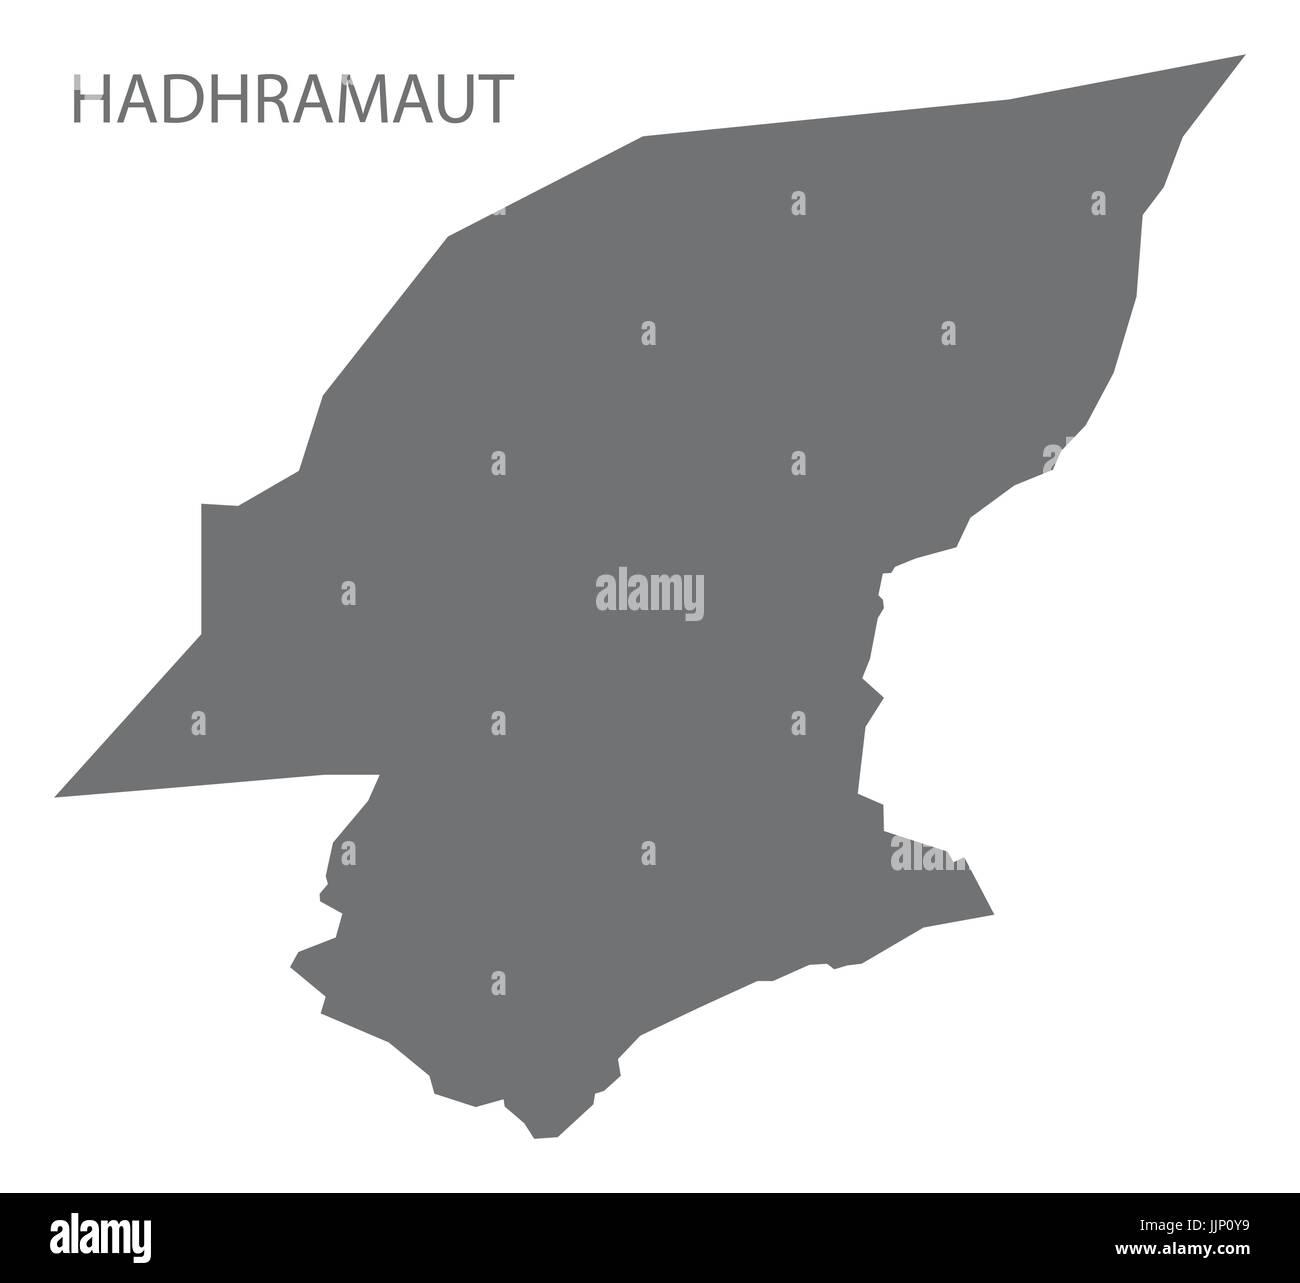 Hadhramaut Yemen governorate map grey illustration silhouette shape - Stock Vector